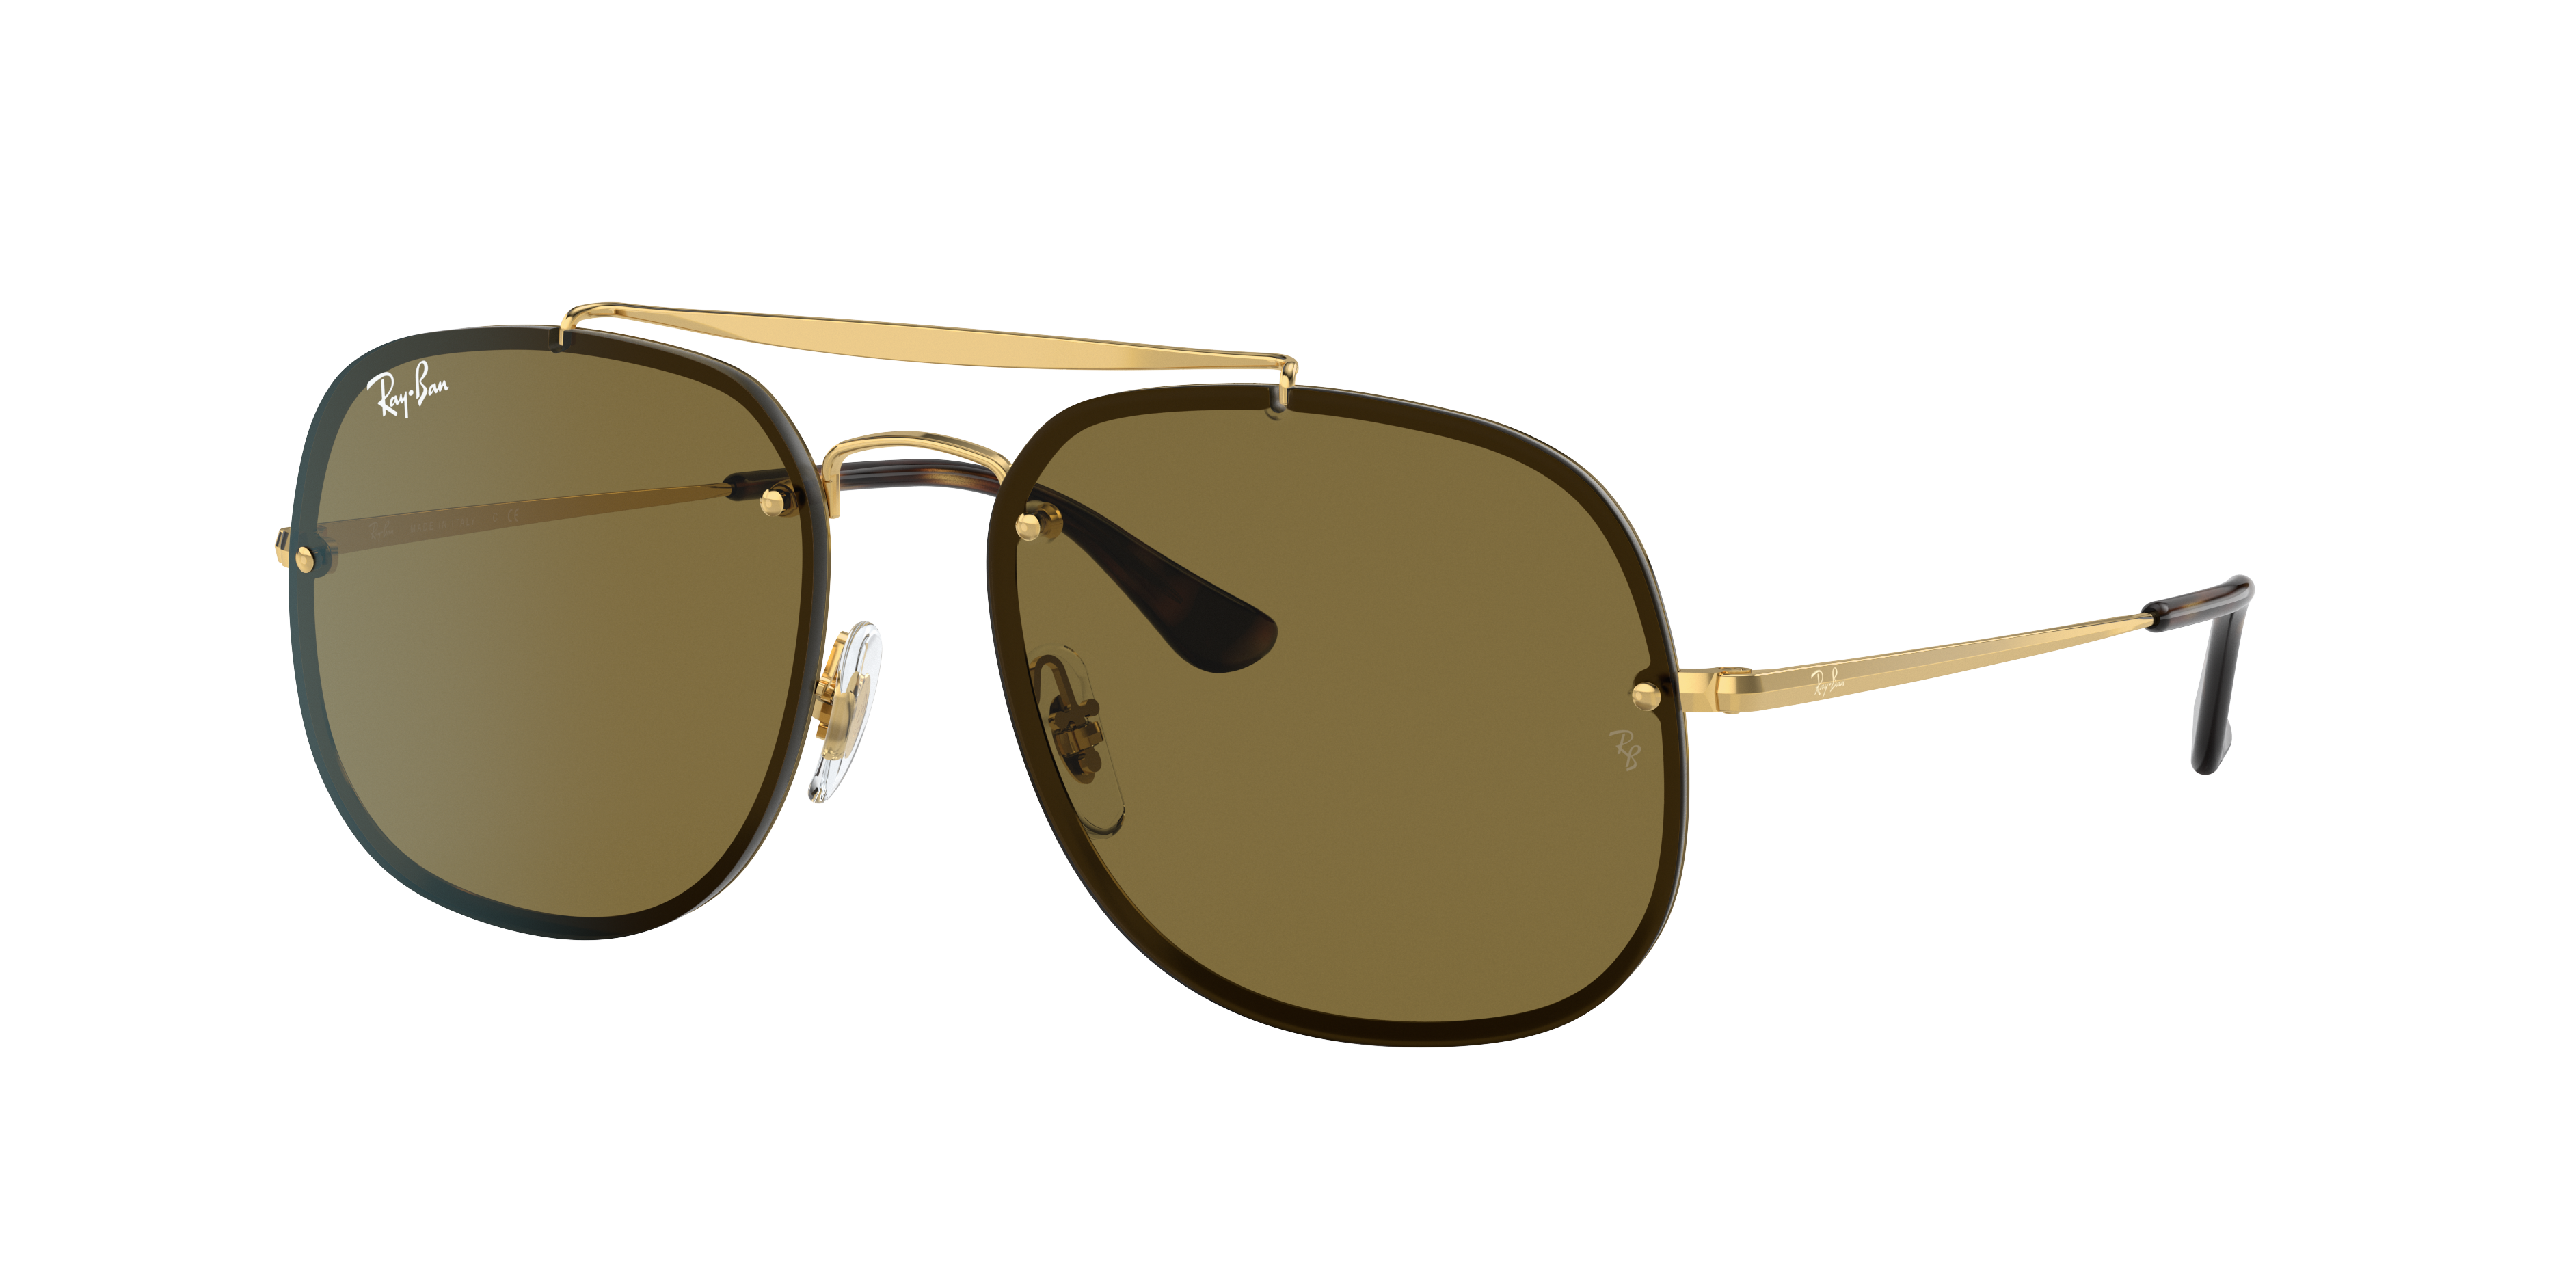 Ray-Ban Blaze General Gold, Brown Lenses - RB3583N